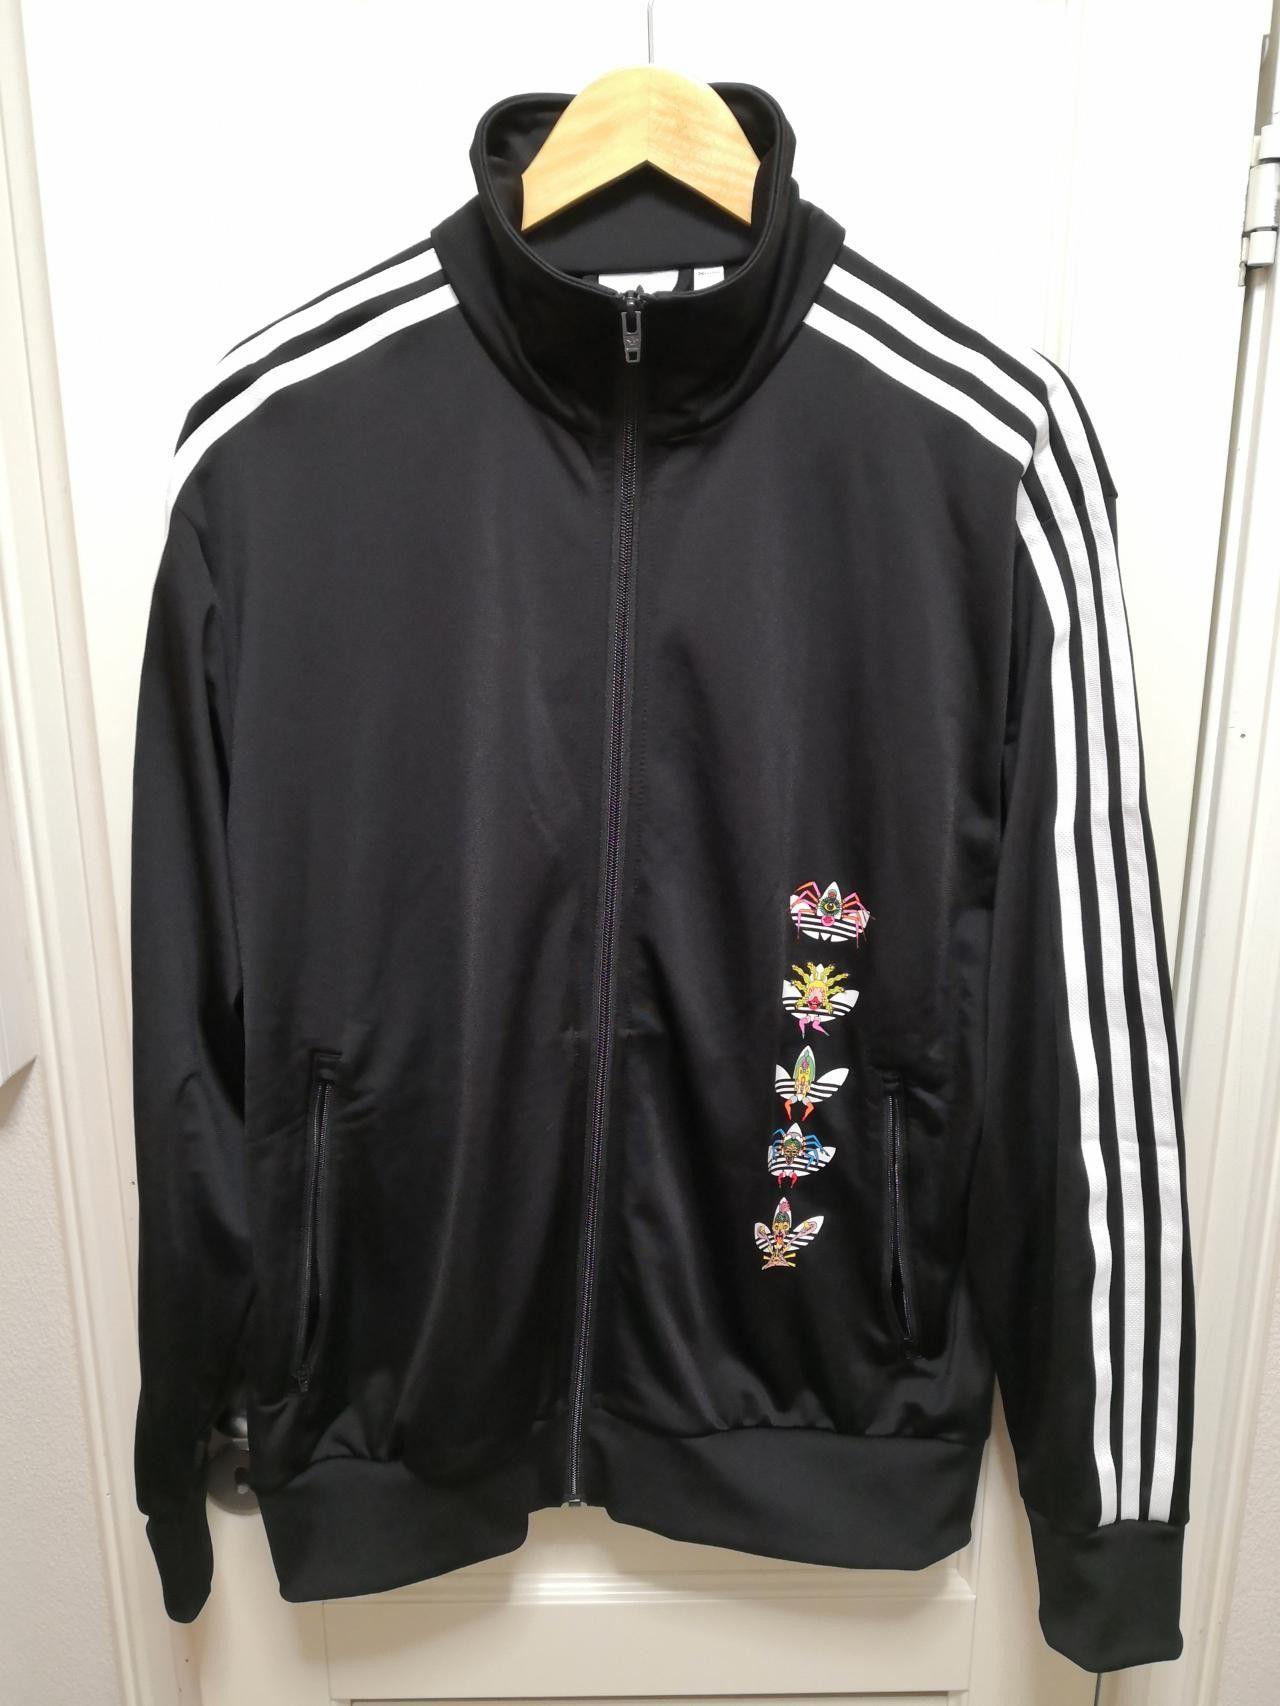 Adidas x Keiichi Tanaami track jacket | FINN.no